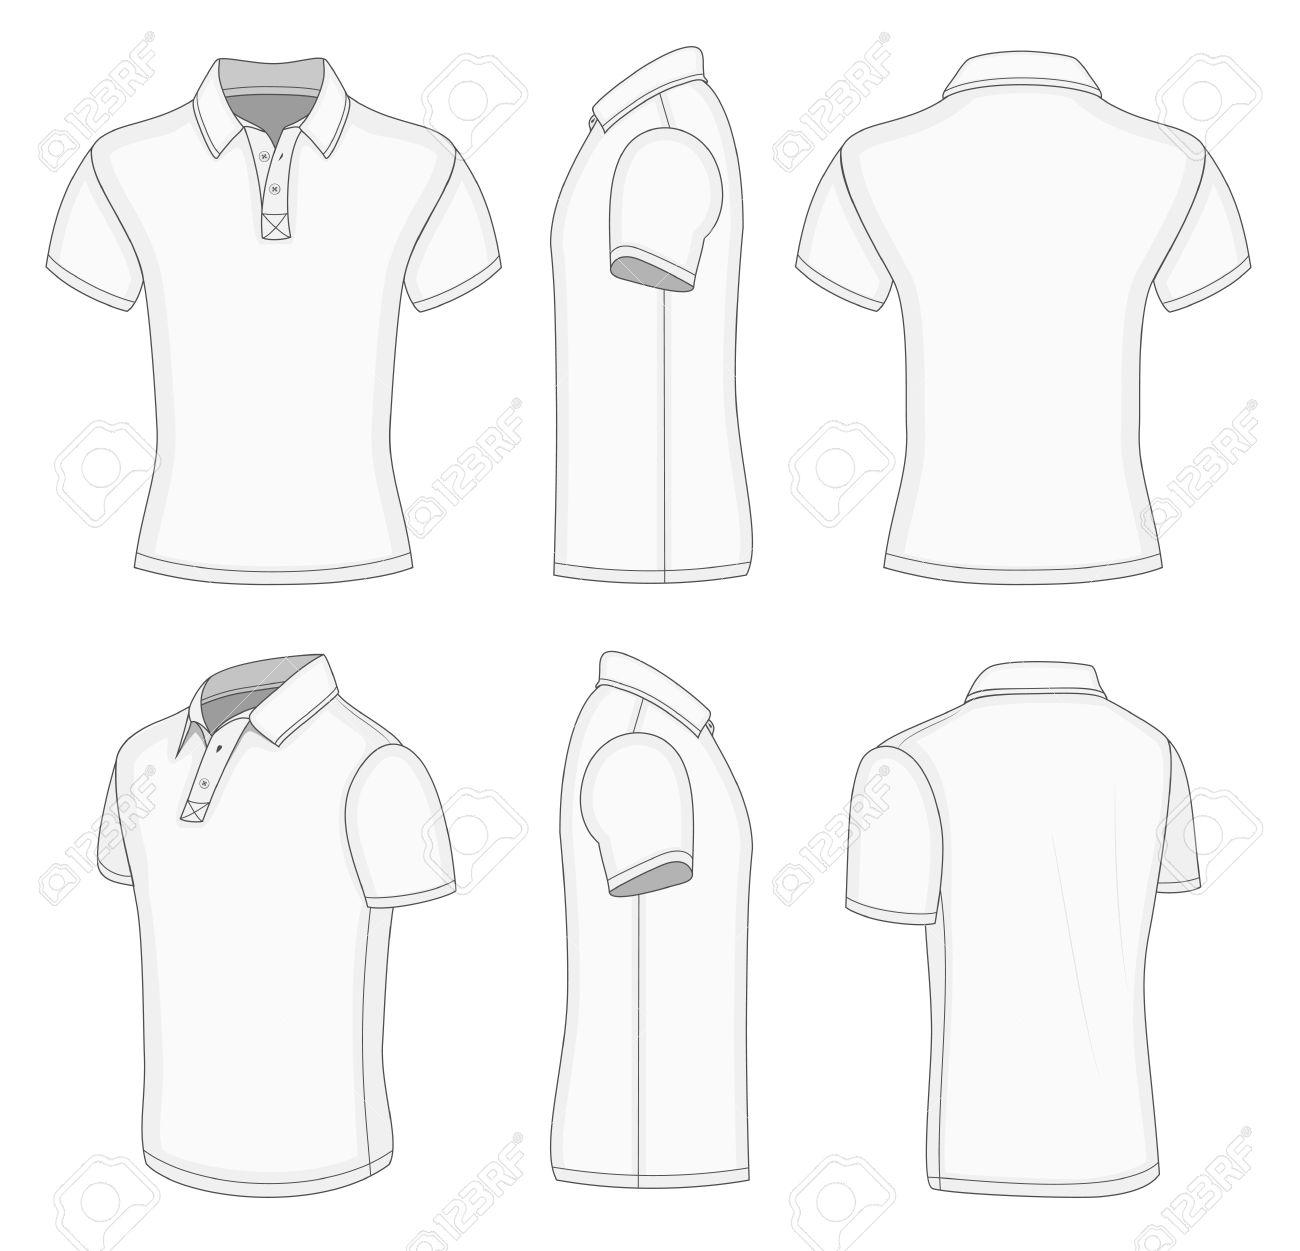 Men\'s White Short Sleeve Polo Shirt Design Templates (front ...